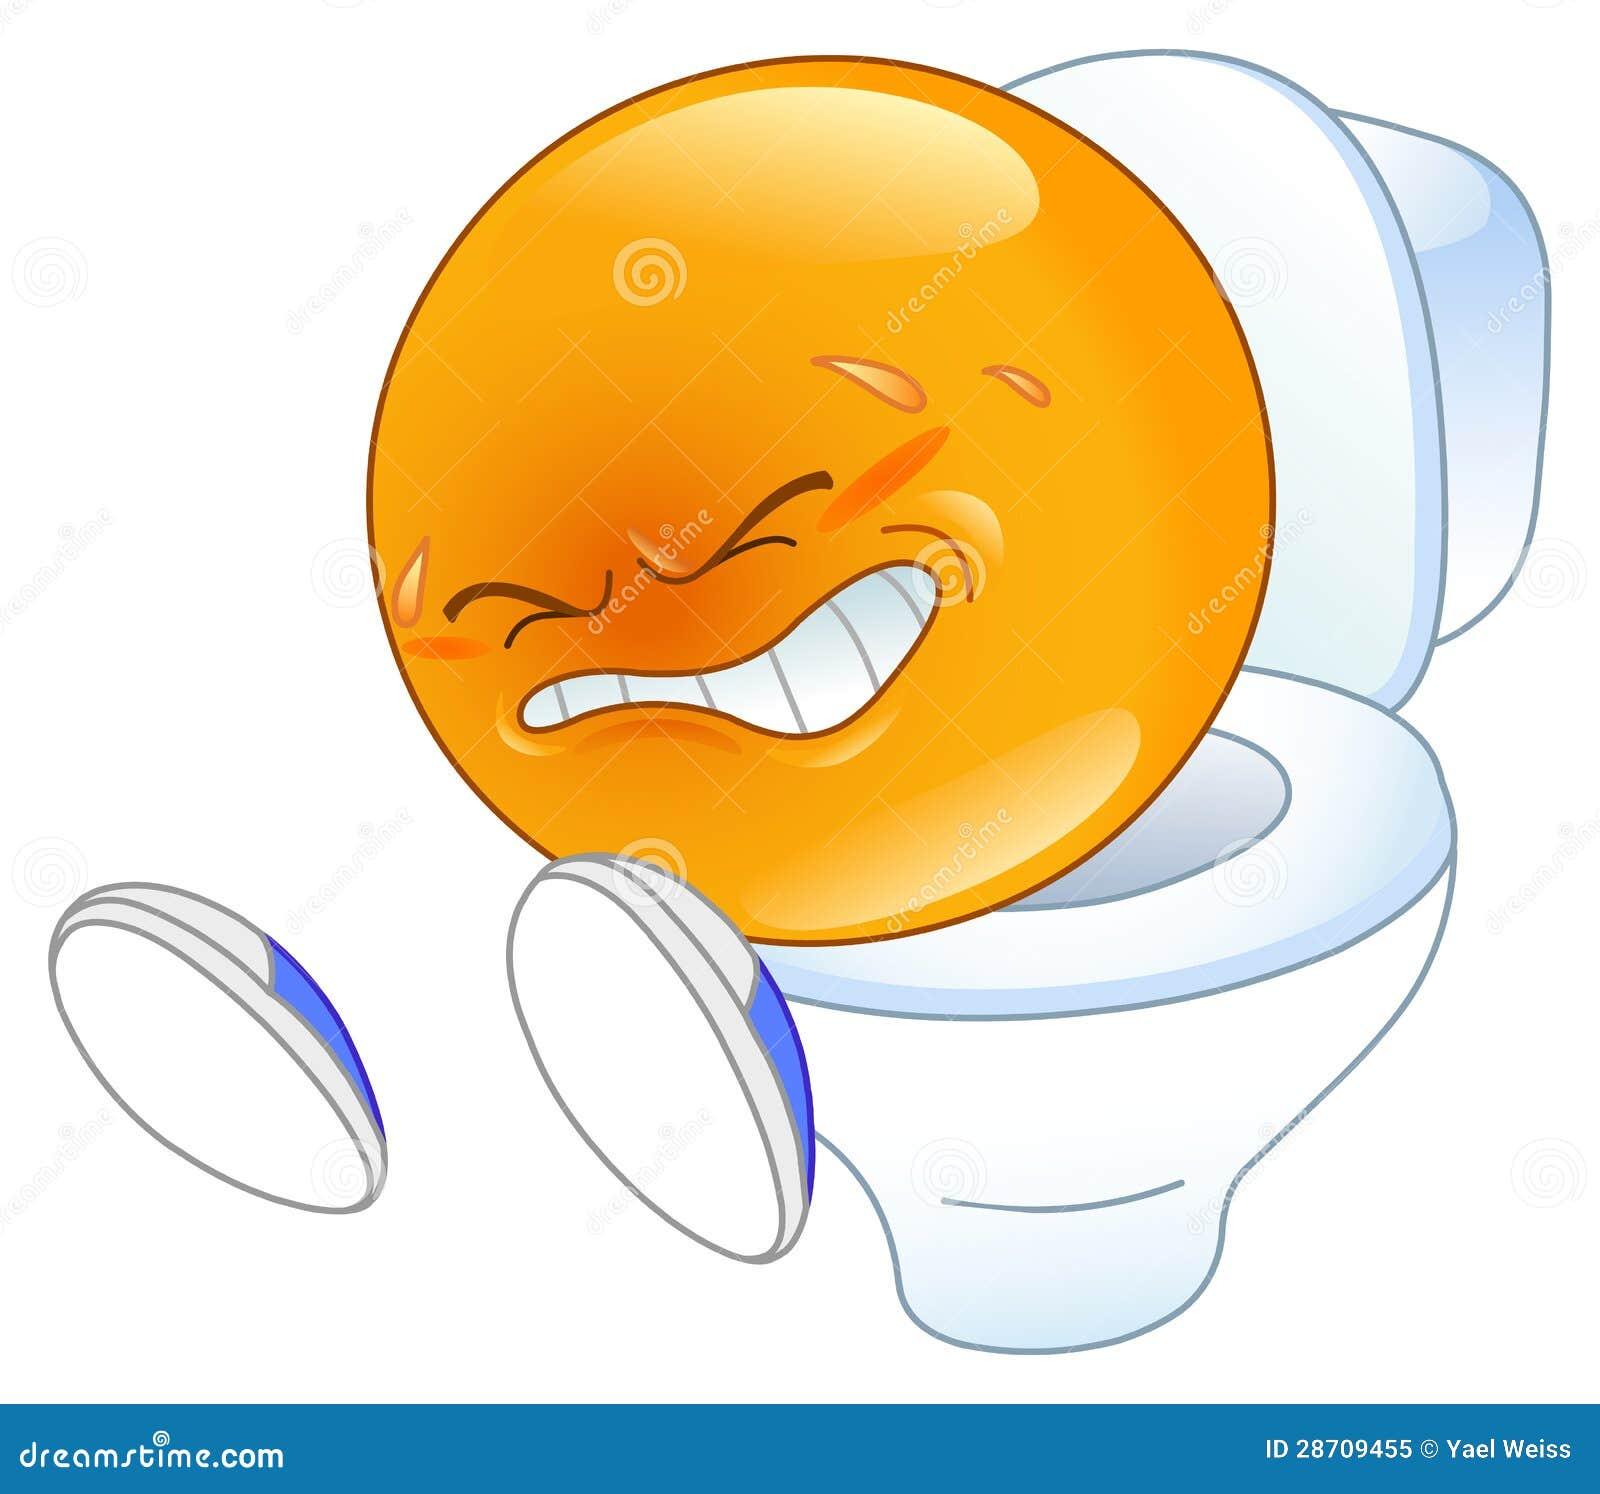 Pooping Emoticon Royalty Free Stock Photo - Image: 28709455